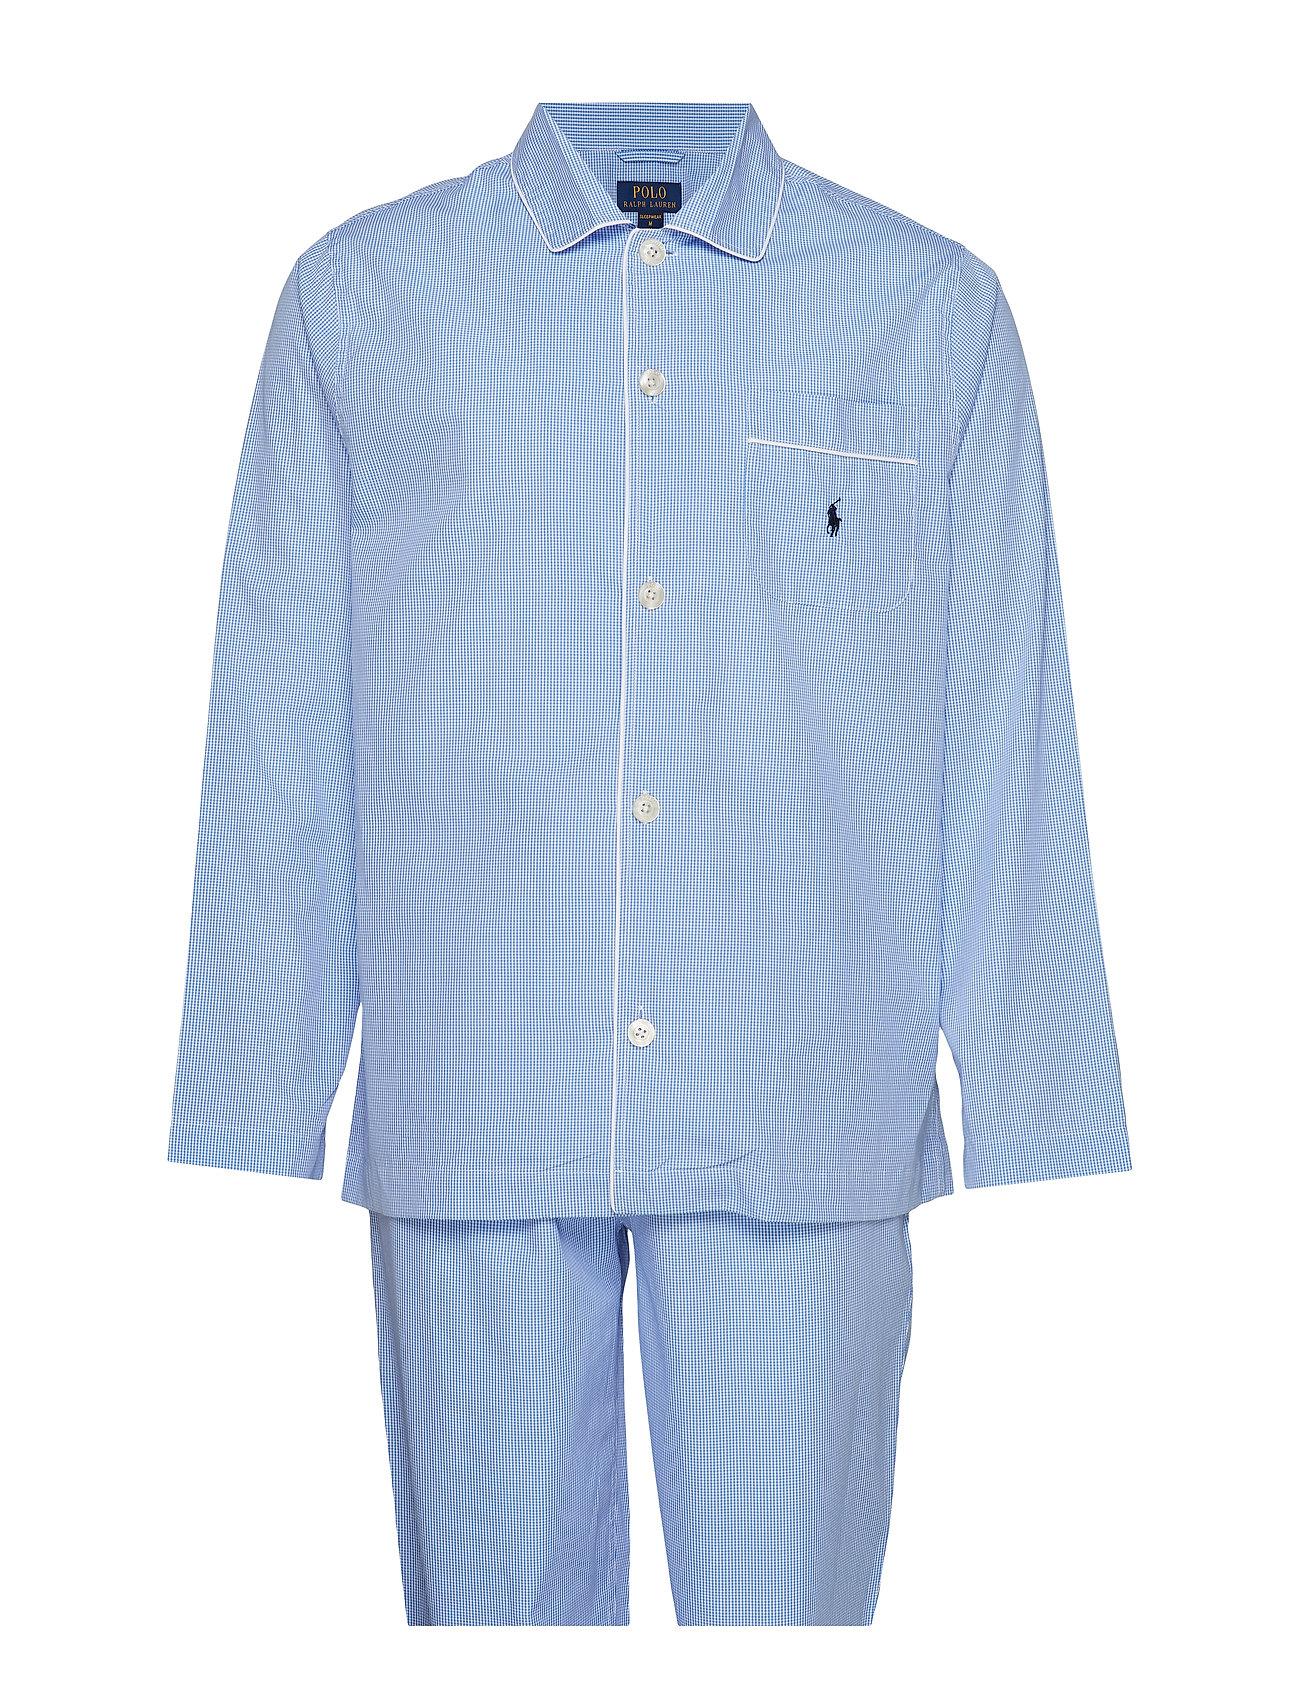 Polo Ralph Lauren Underwear PYJAMA SET LONG - LT BLUE MINI GI